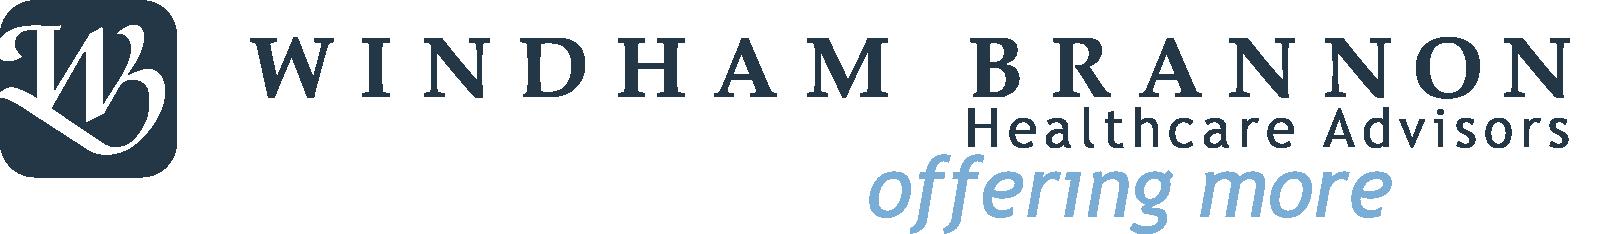 Windham Brannon Healthcare Advisors